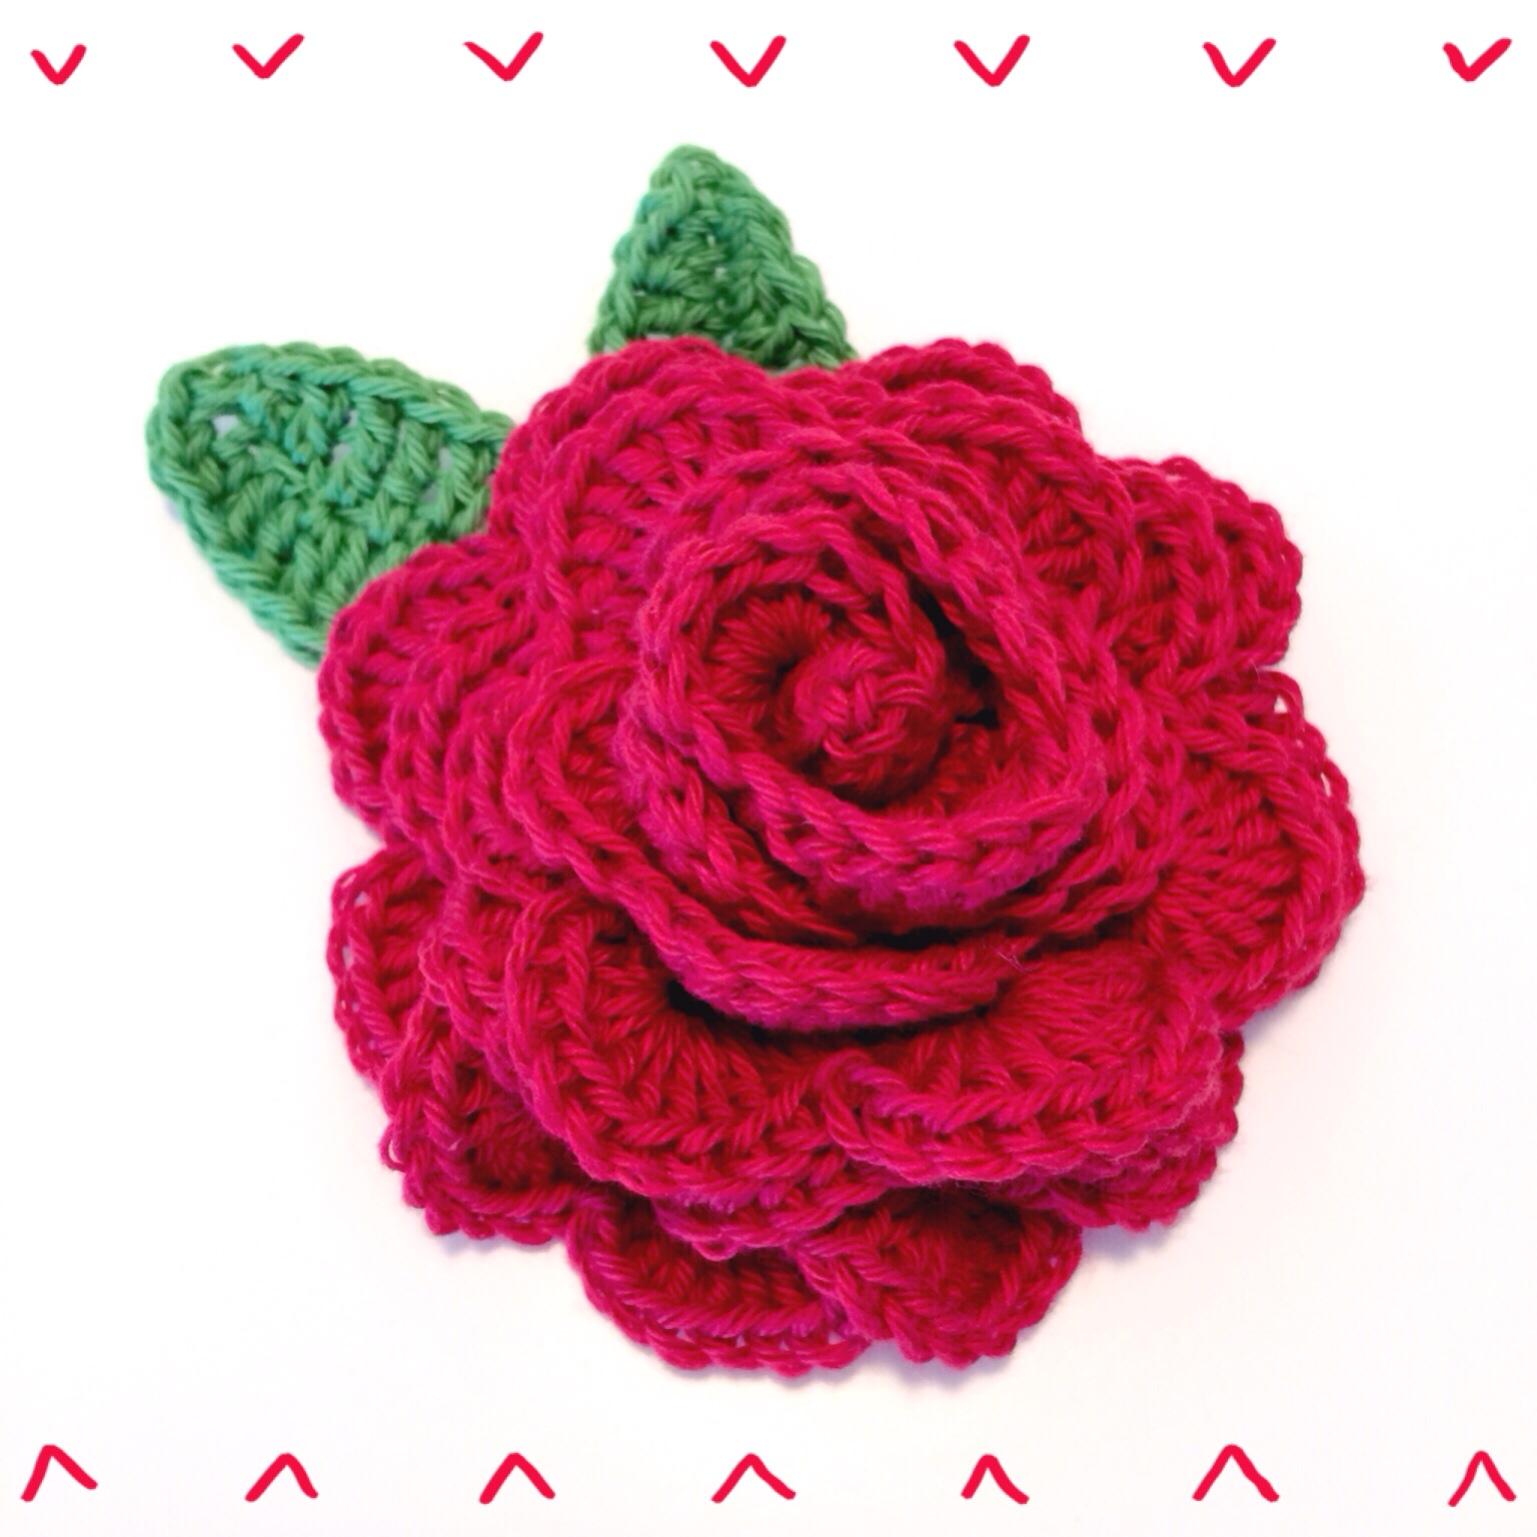 Smuk rose